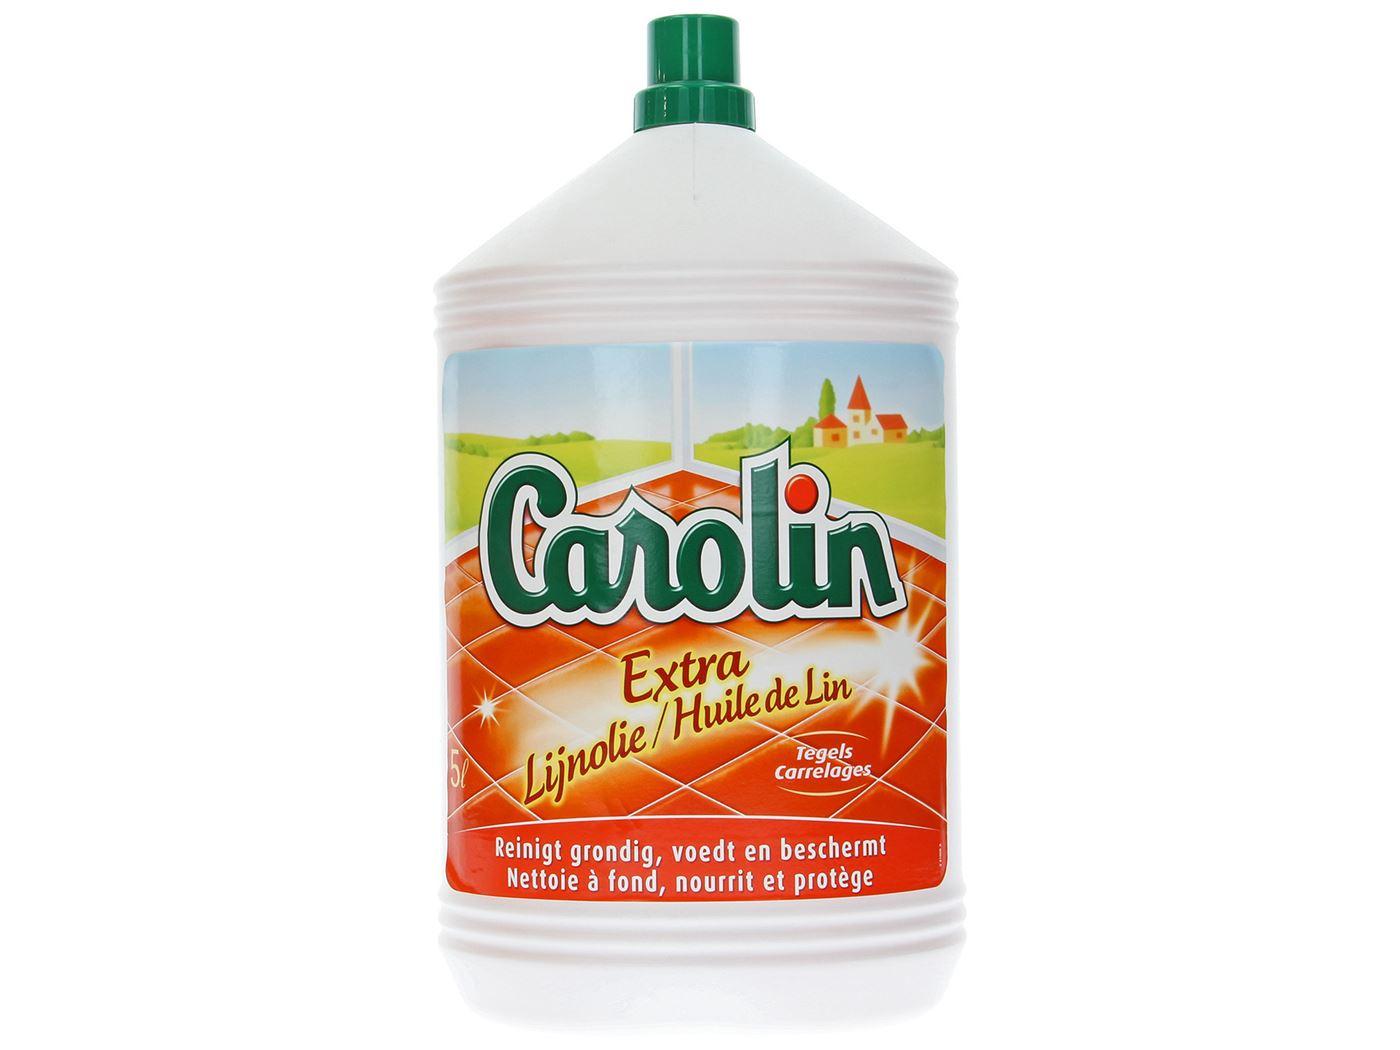 carolin-extra-lijnolie